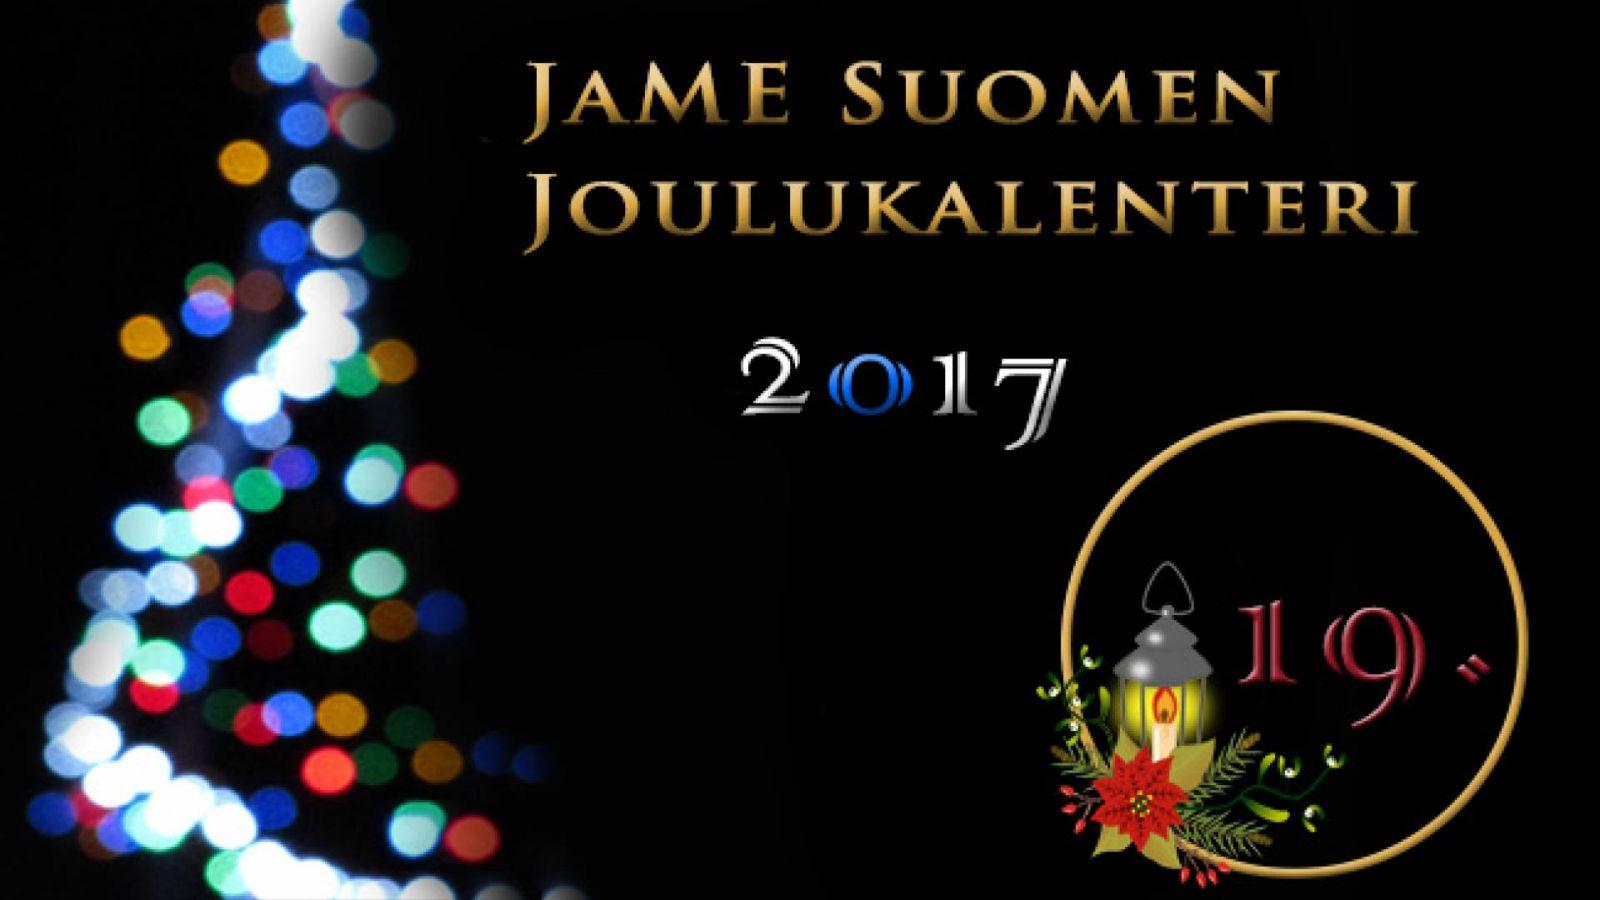 JaME Suomen joulukalenterin 19. luukku © Nipsu